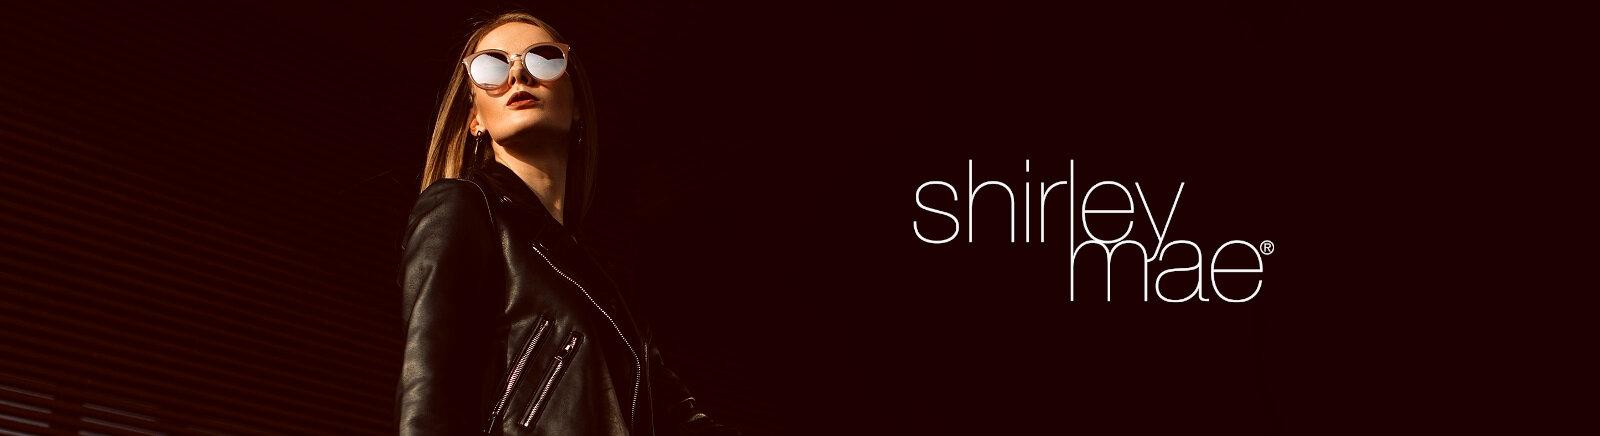 Prange: Shirley Mae Damenschuhe online shoppen